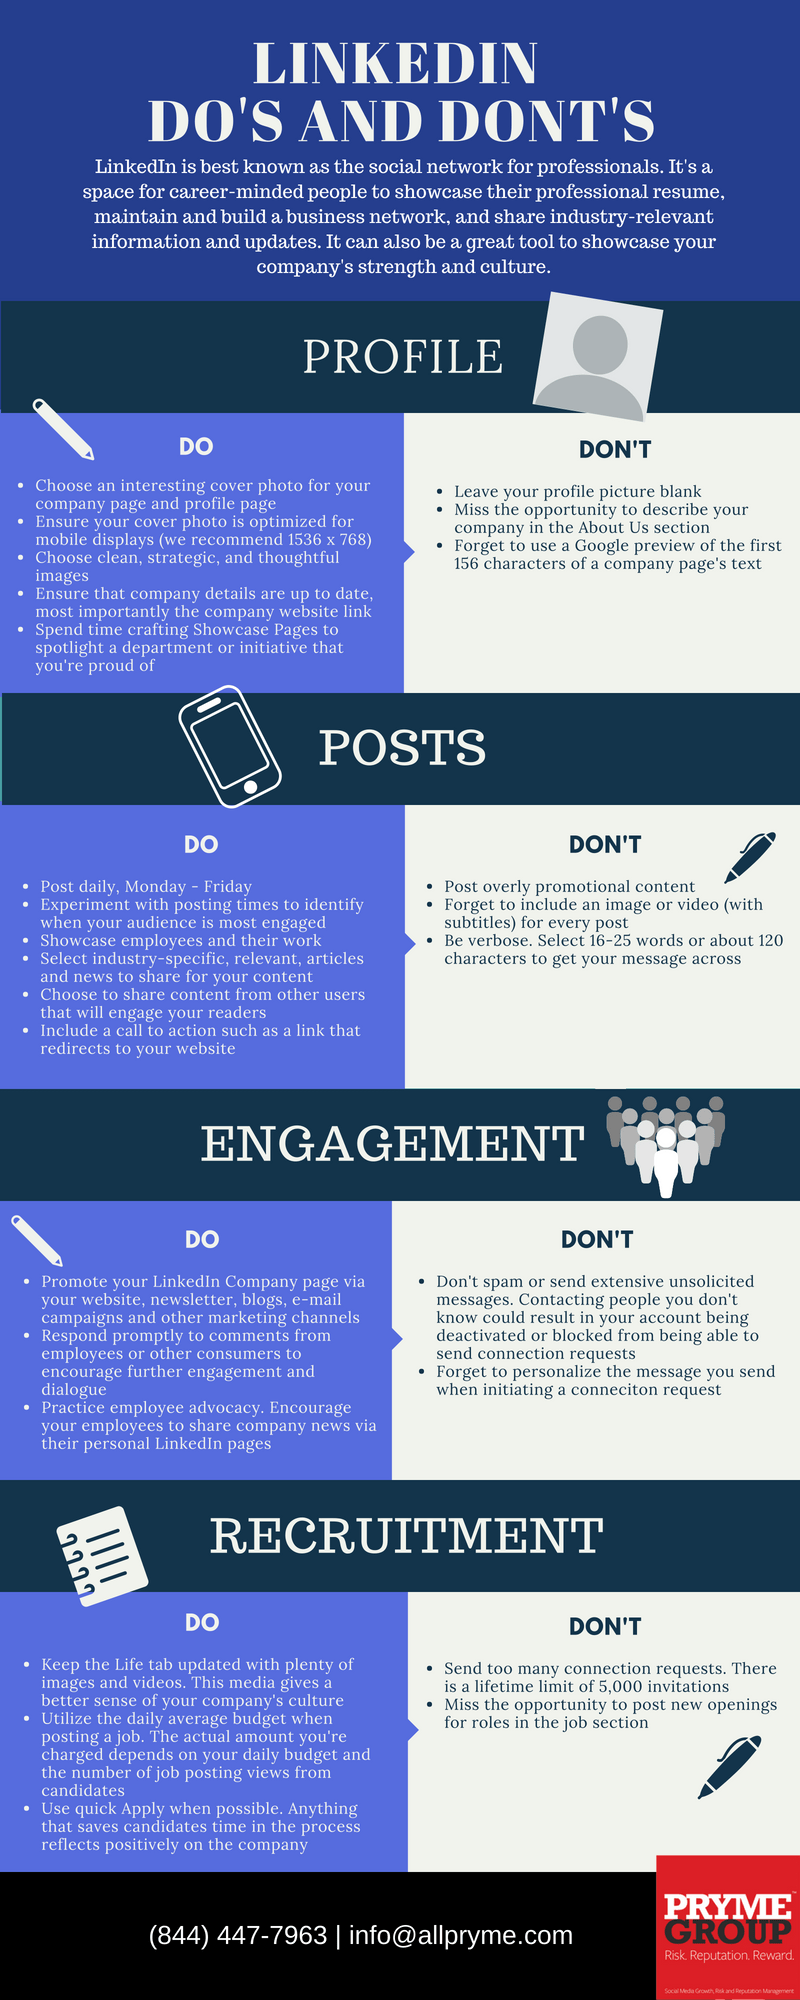 LinkedIn Do's & Don'ts Infographic